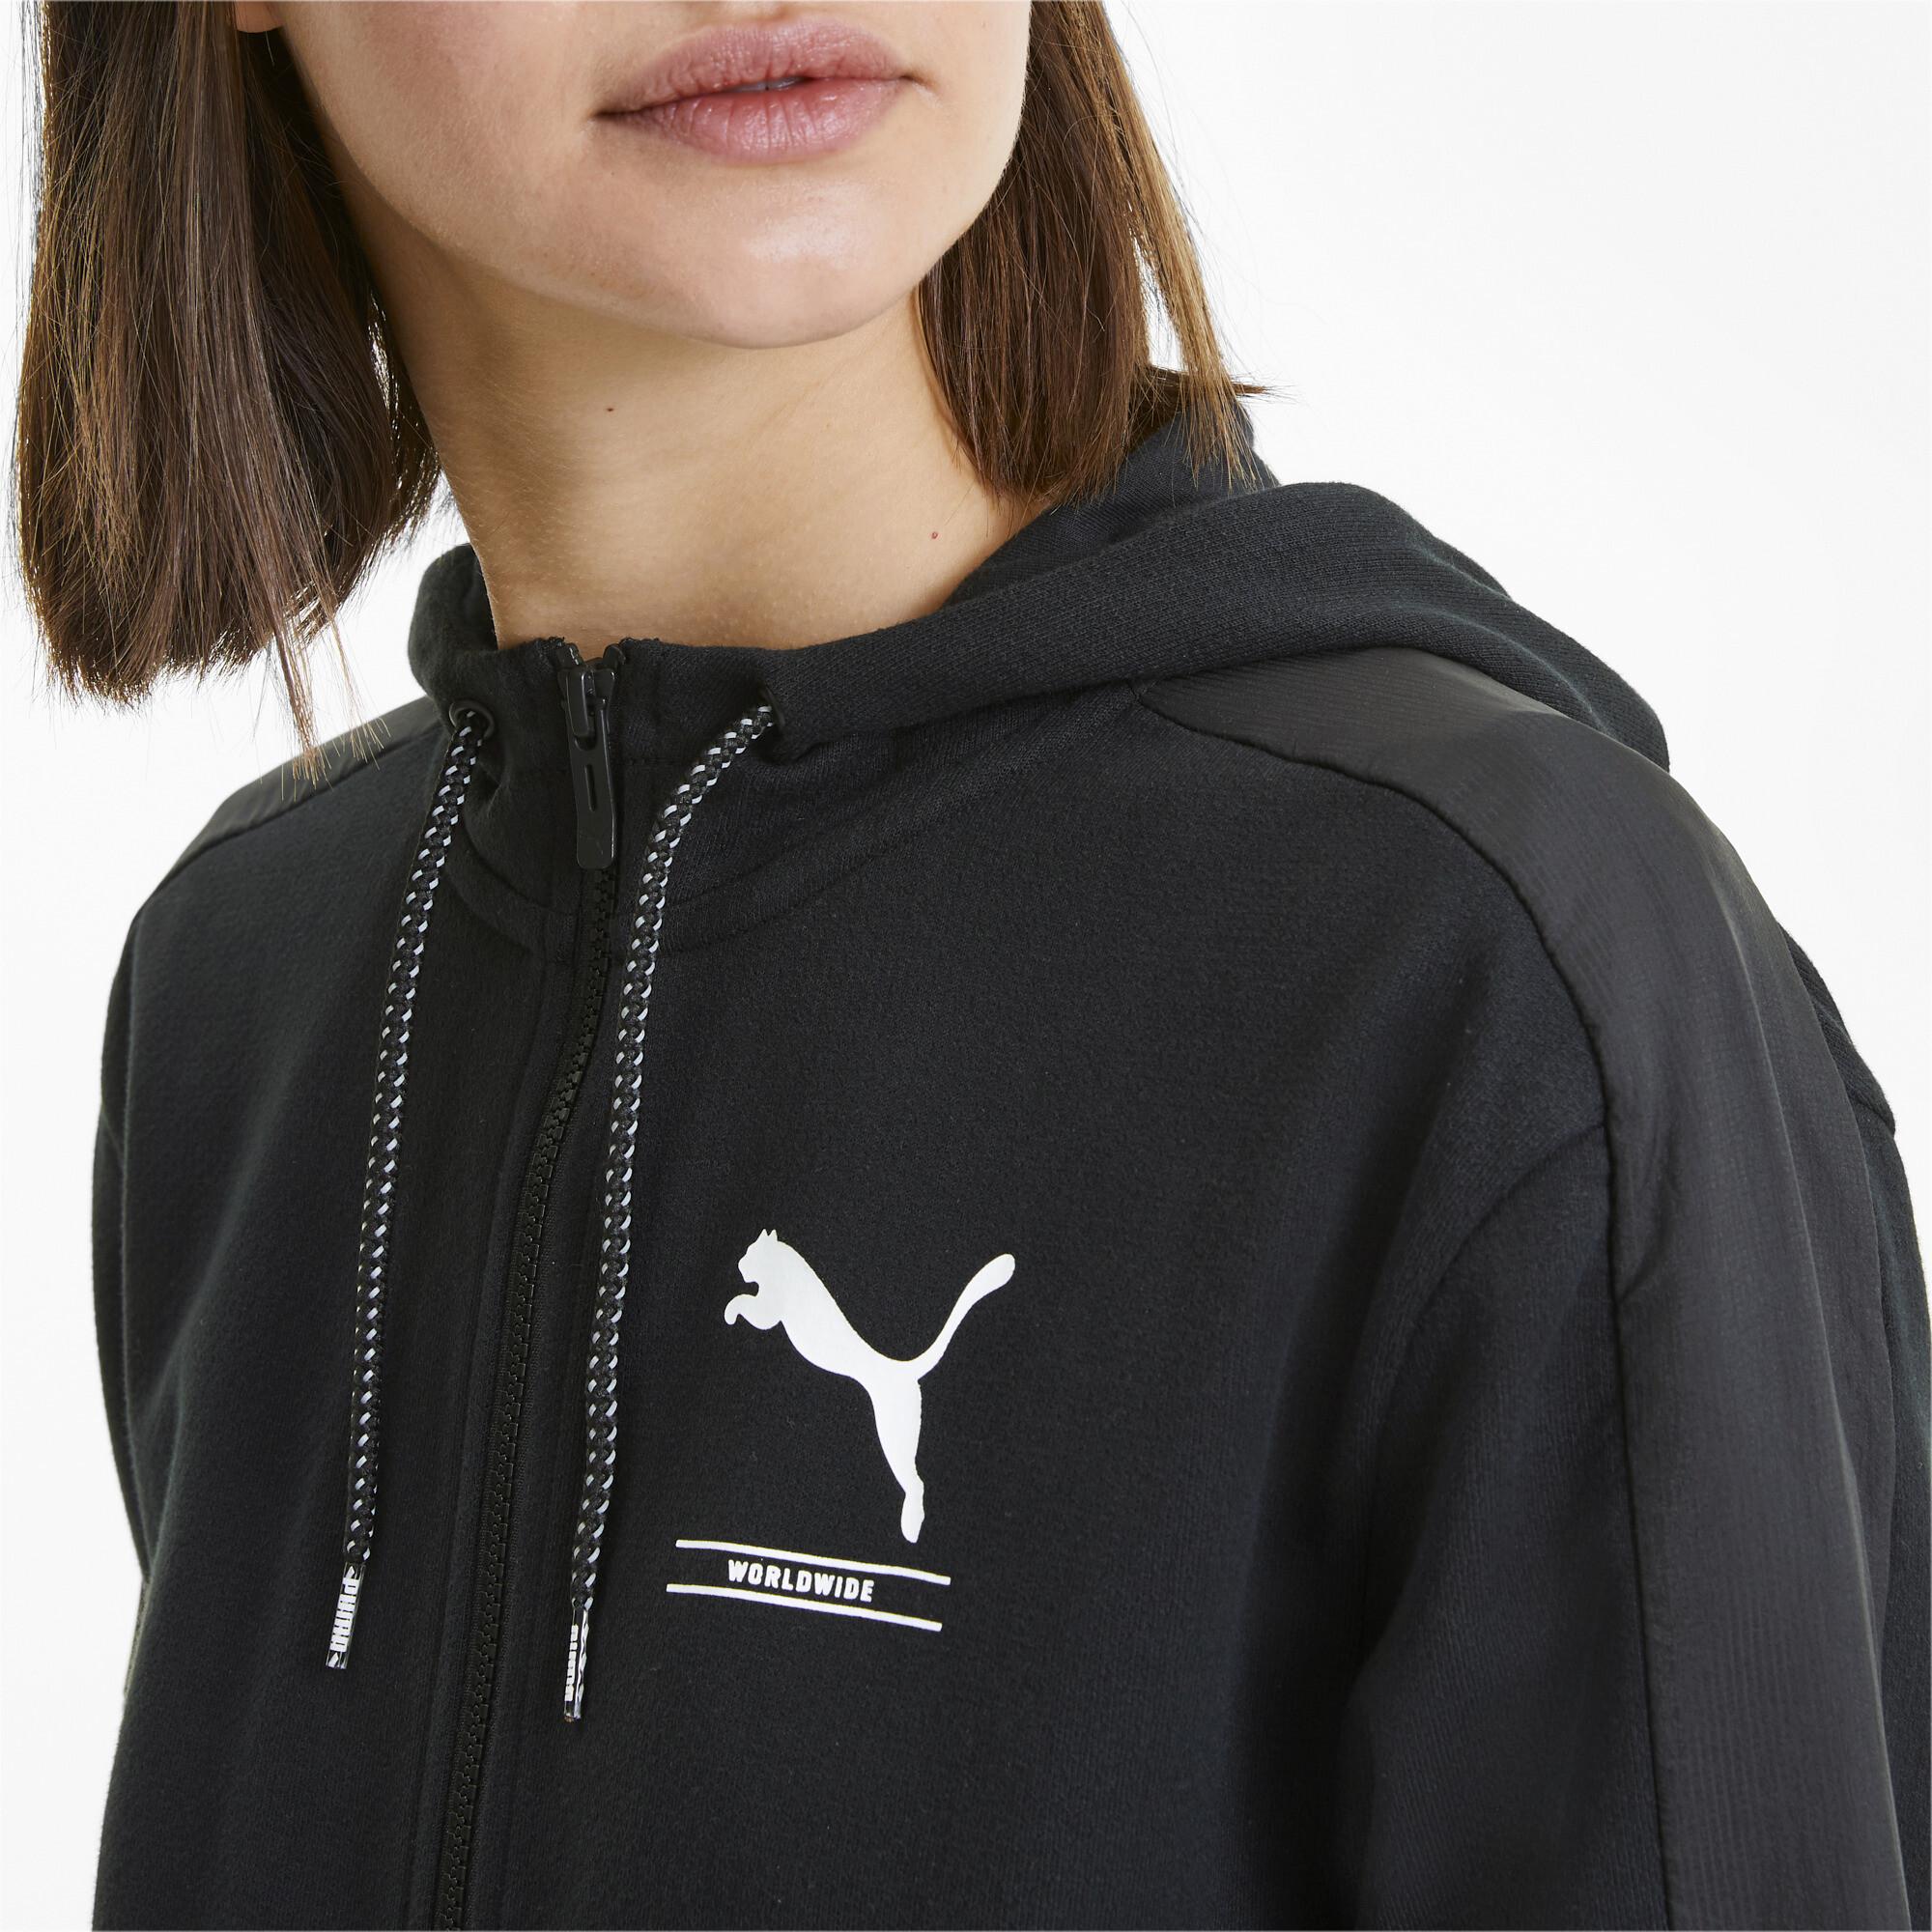 PUMA-NU-TILITY-Women-039-s-Full-Zip-Hoodie-Women-Sweat-Basics miniatuur 12